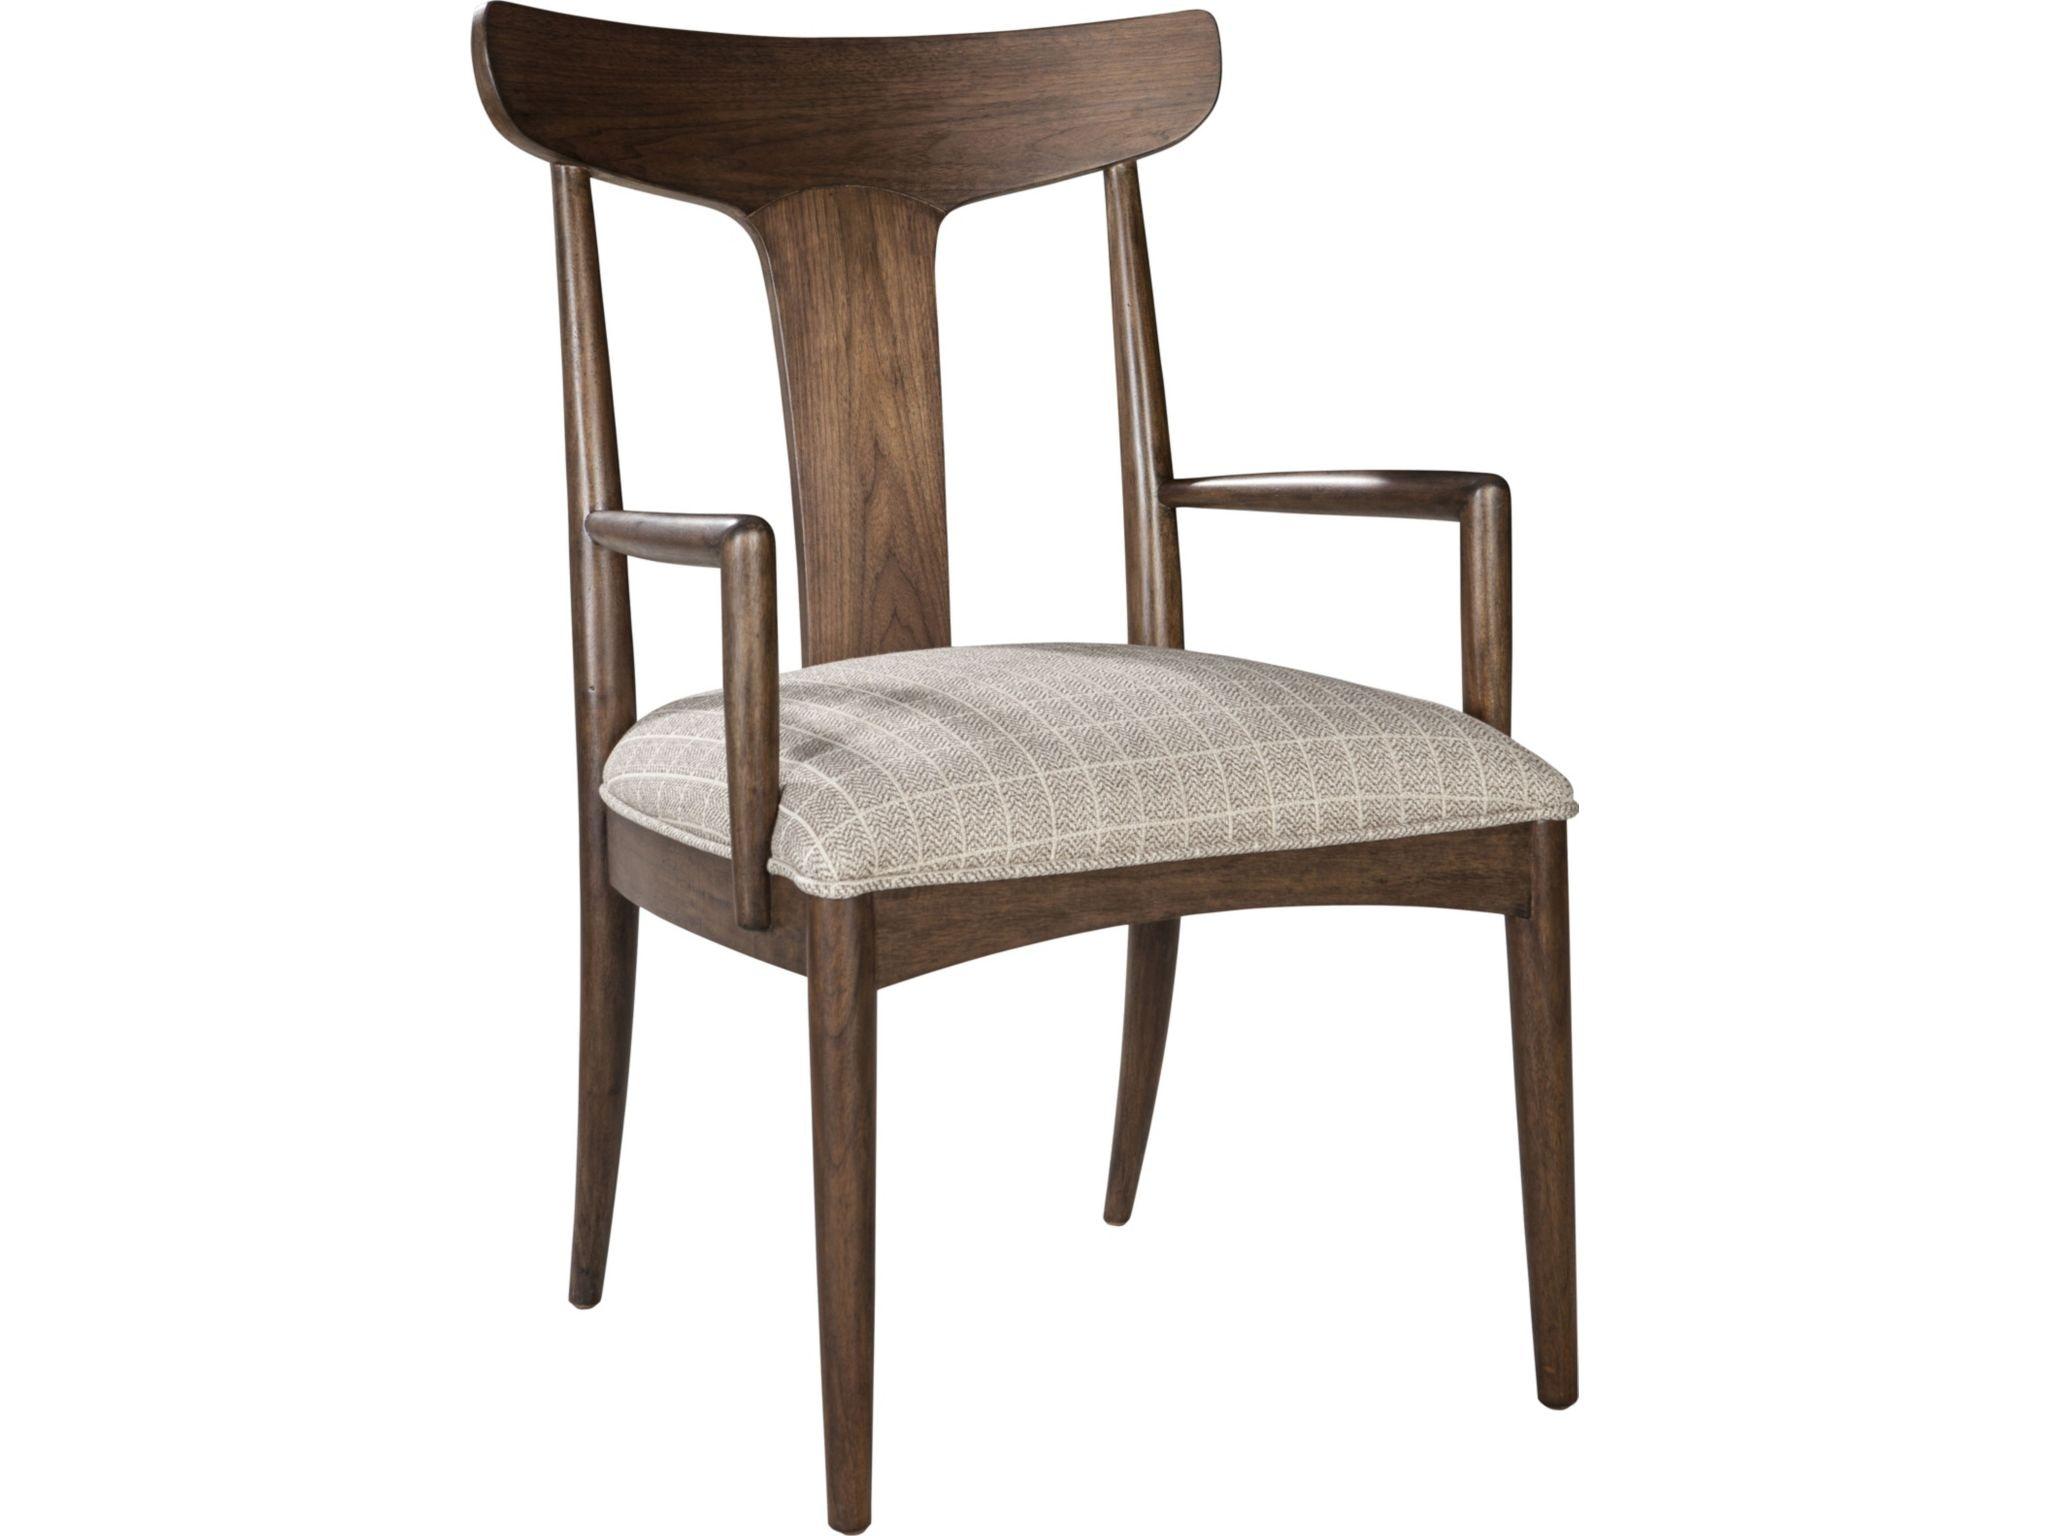 Thomasville Lania Arm Chair 85821 822